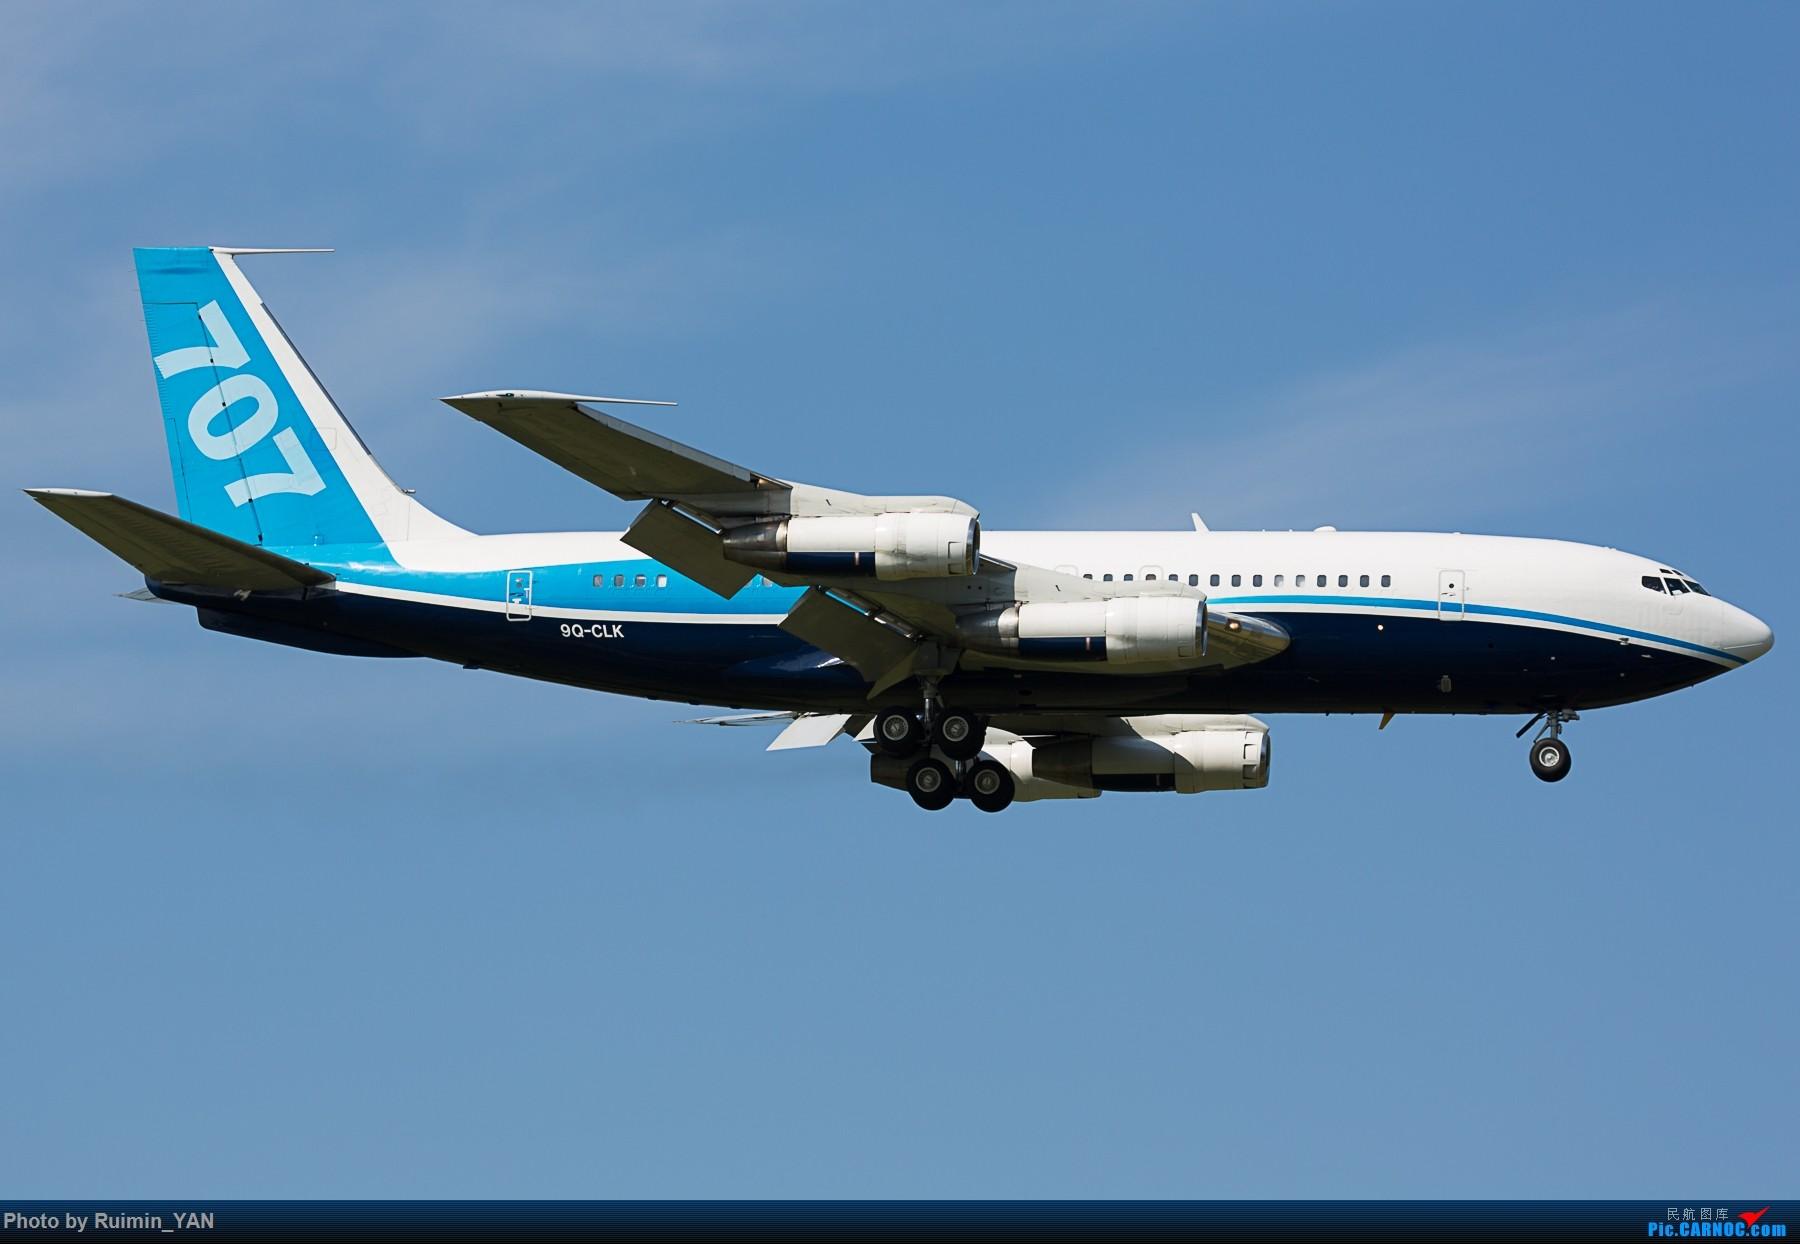 Re:[原创]【PEK】【砖机】【波音707】刚果民主共和国总统卡比拉 刚果金政府(Democratic Republic of the Congo) 9Q-CLK B701 BOEING 707-100 9Q-CLK 中国北京首都国际机场